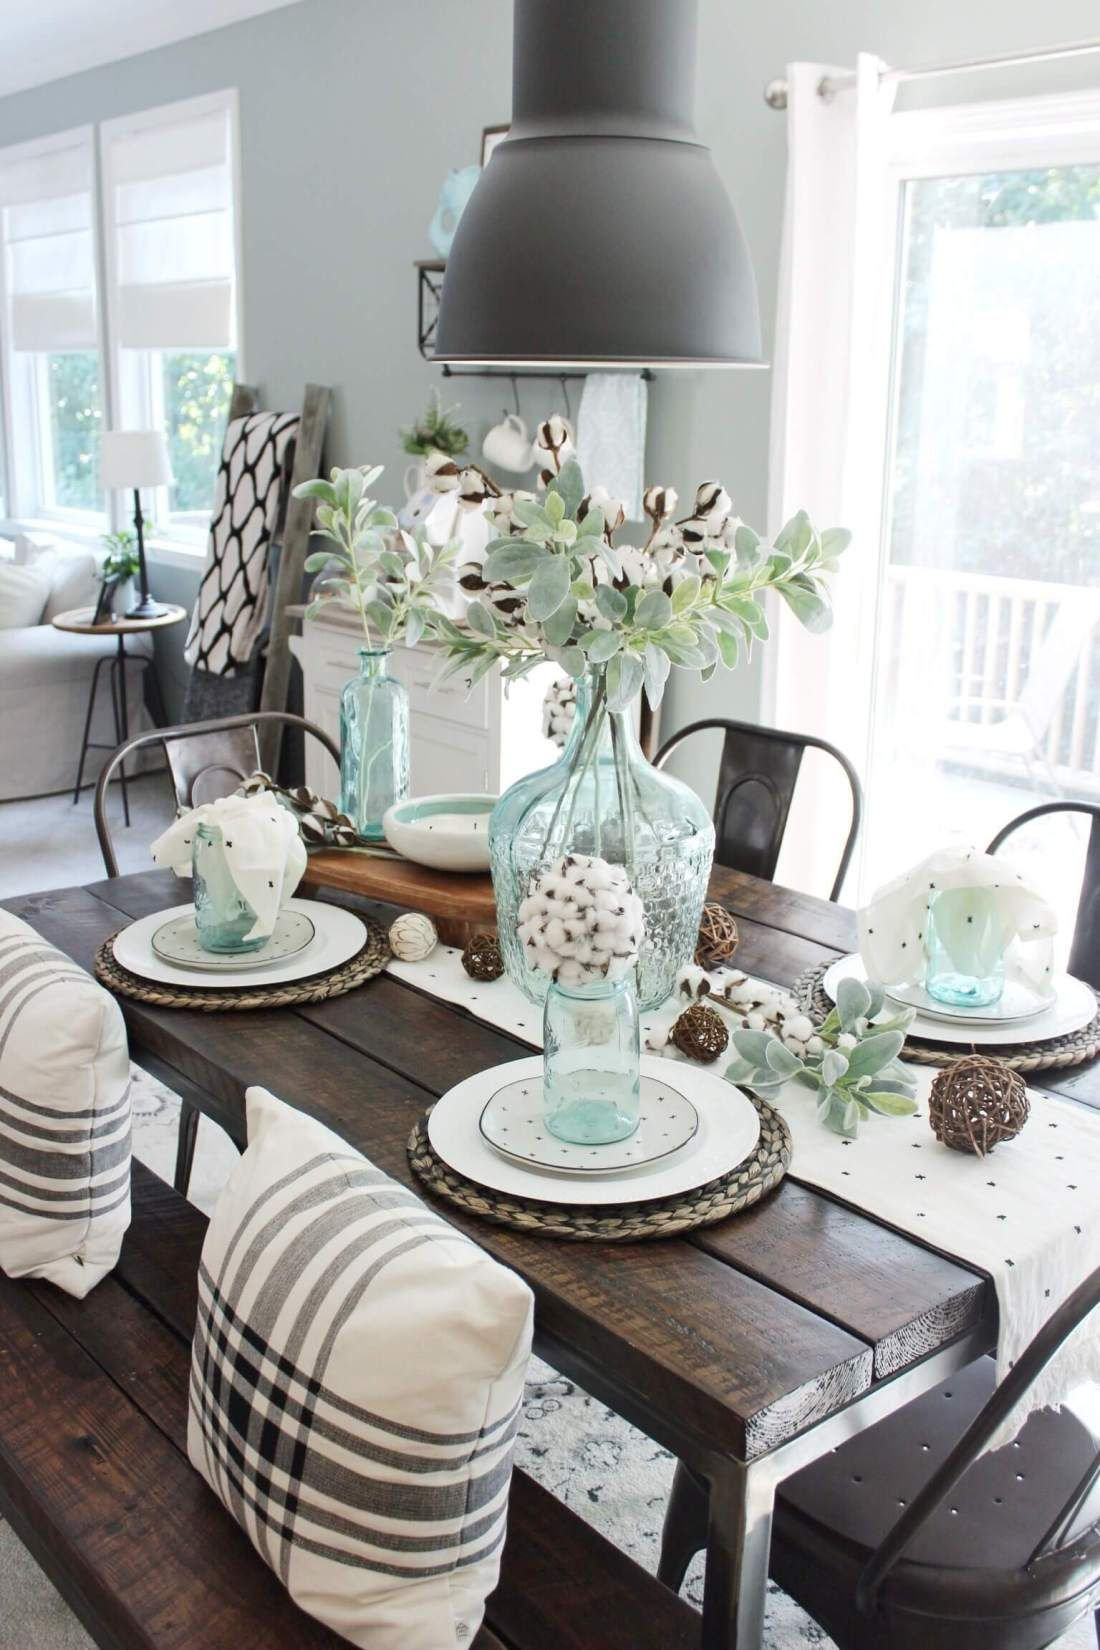 28 Stunning Farmhouse Dining Room Decor Design Ideas For 2021 Farmhouse Dining Rooms Decor Dining Table Decor Farmhouse Dining